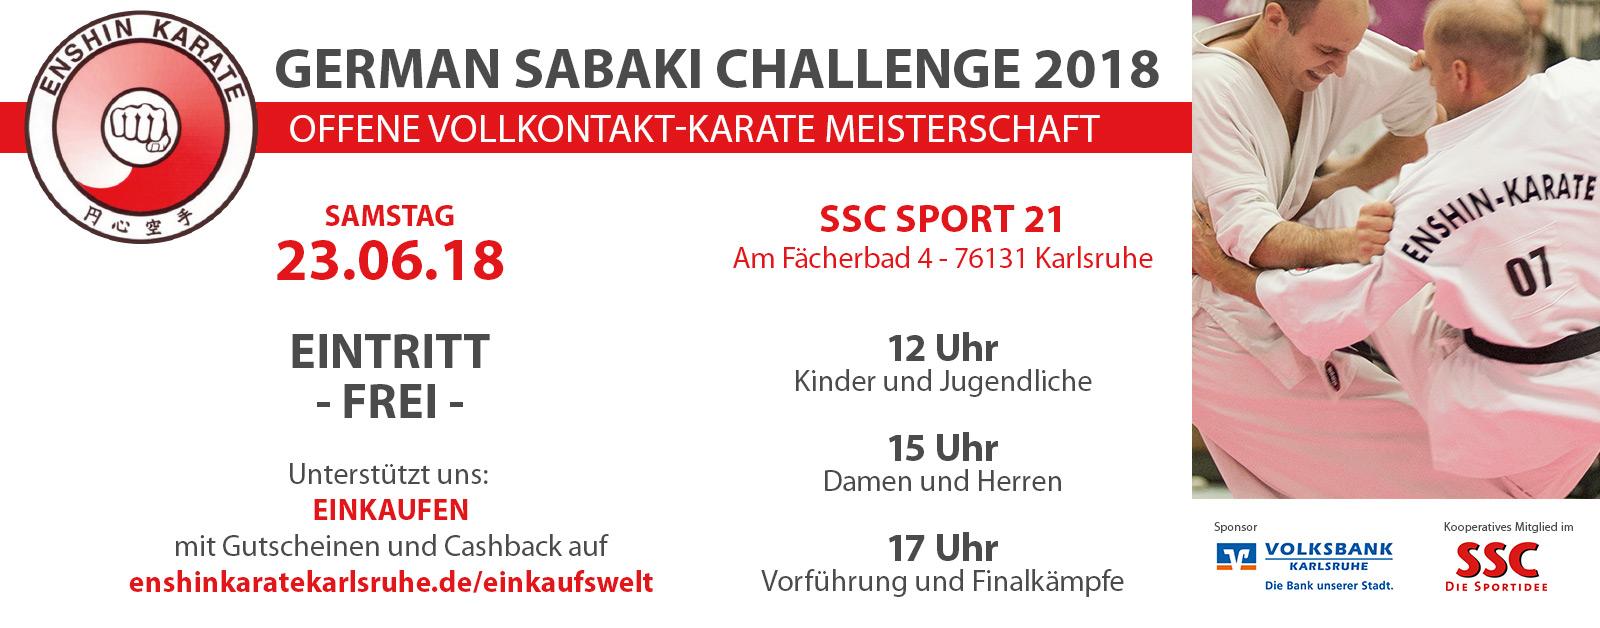 German Sabaki Challenge